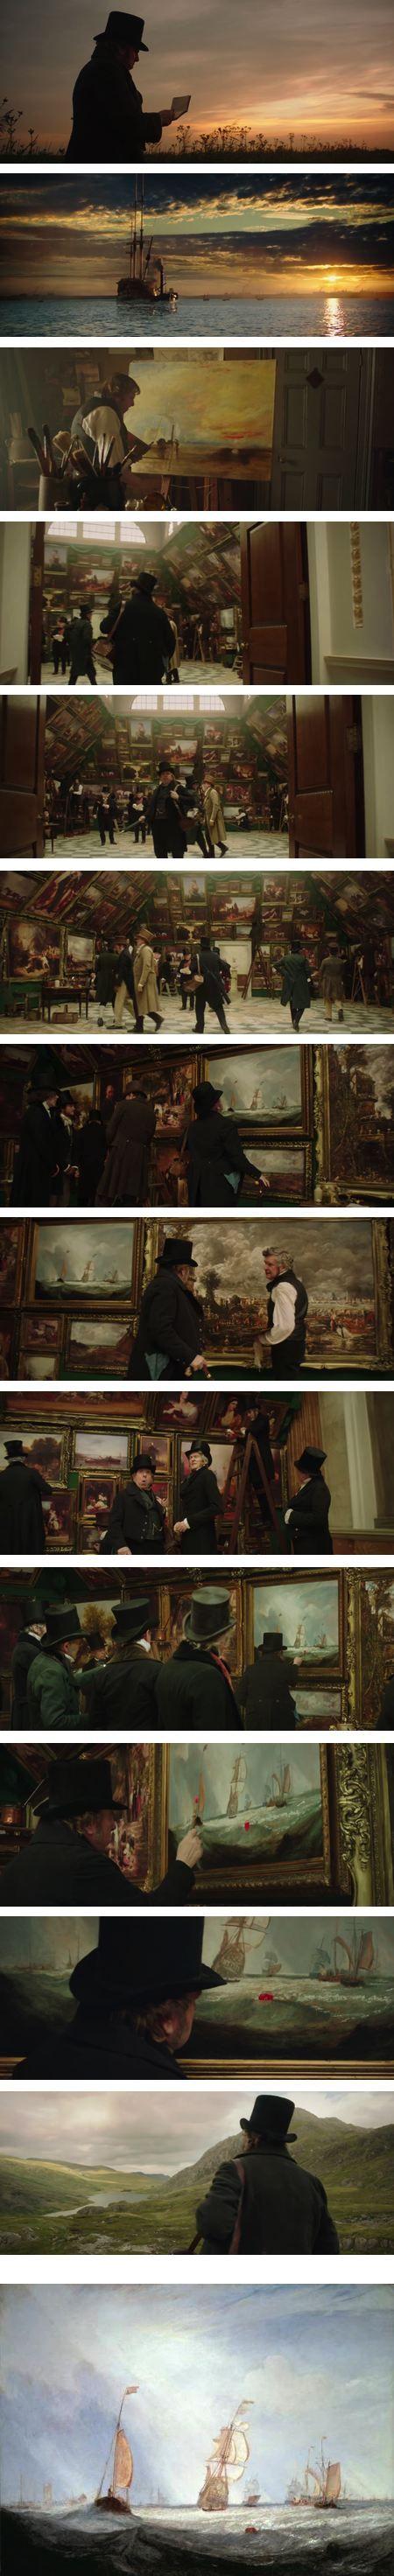 Mr. Turner, JMW Turner biopic                                                                                                                                                                                 More